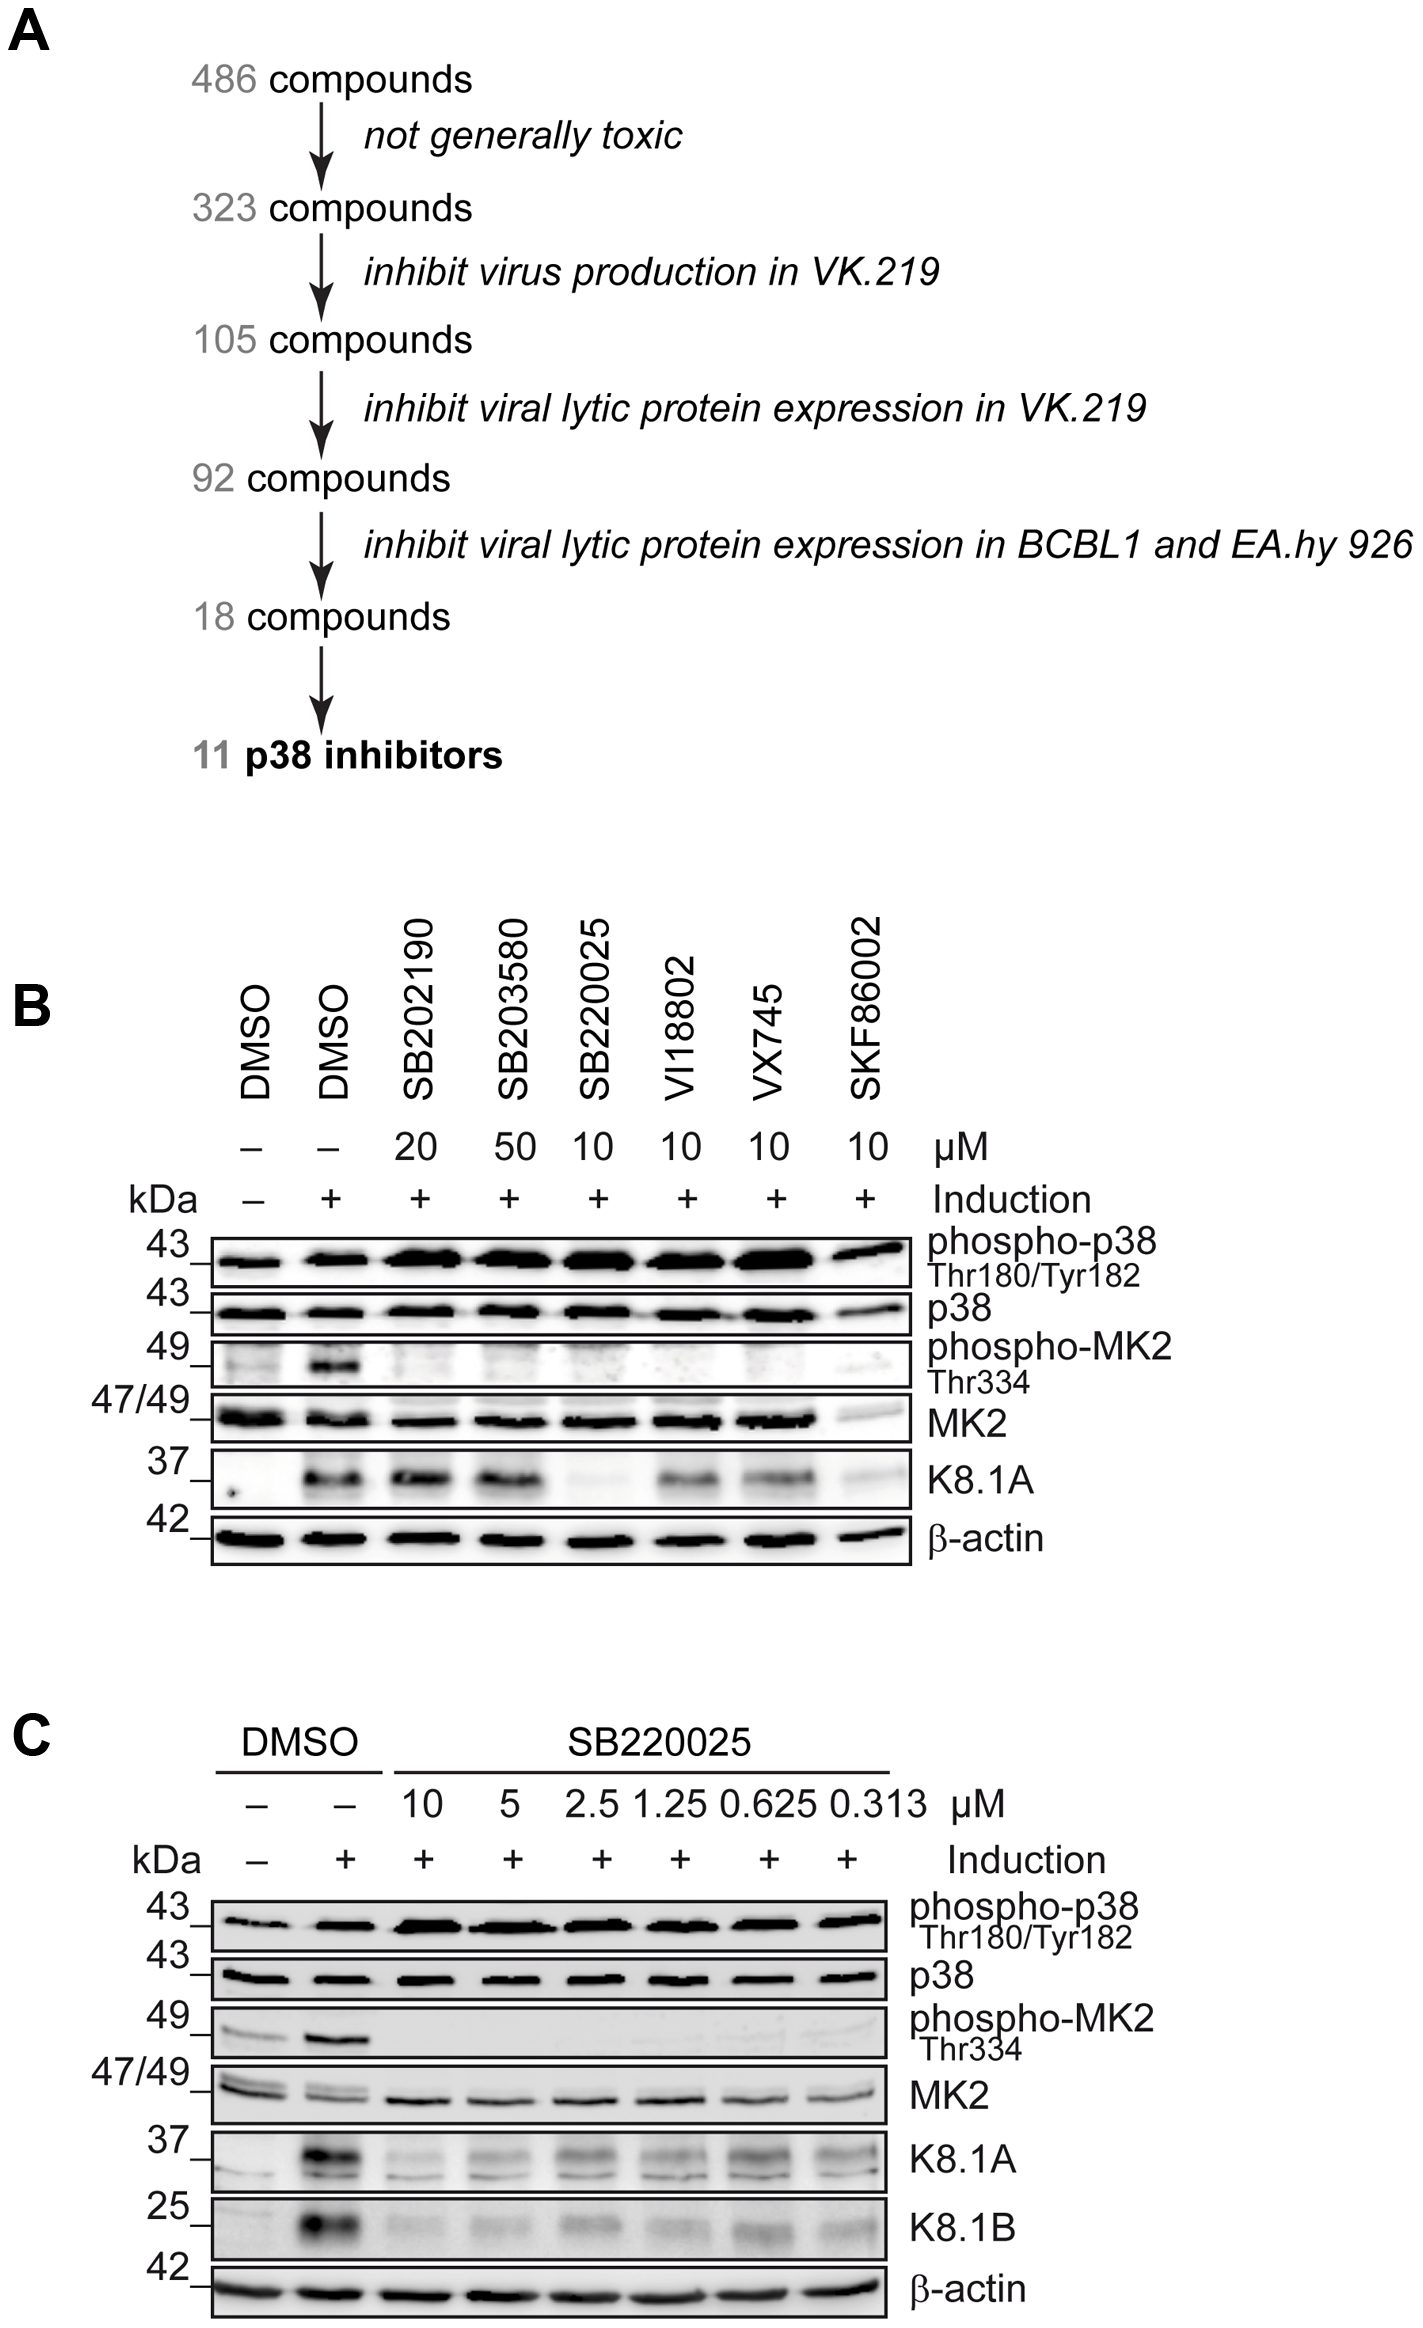 Identification of cellular kinases involved in KSHV reactivation.